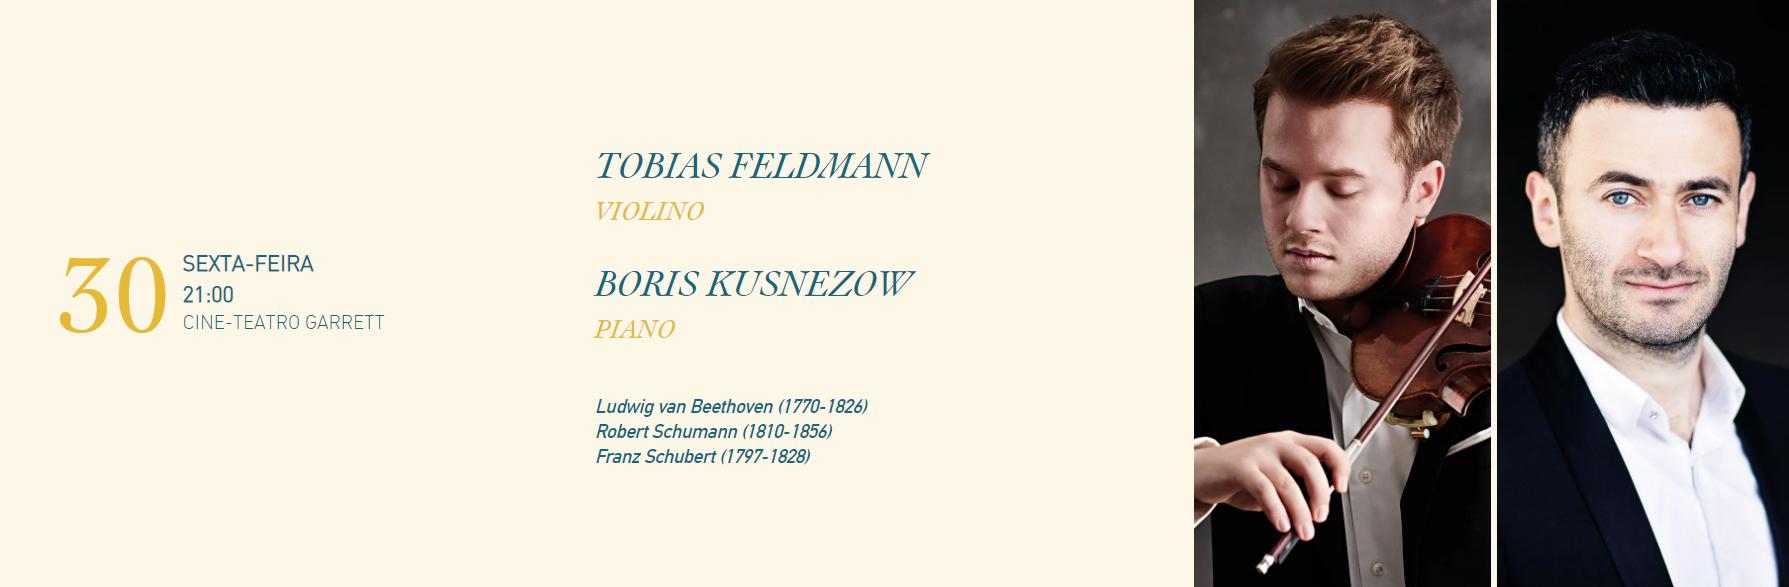 Festival da Povoa de Varzim   Tobias Feldmann e Boris Kusnezow